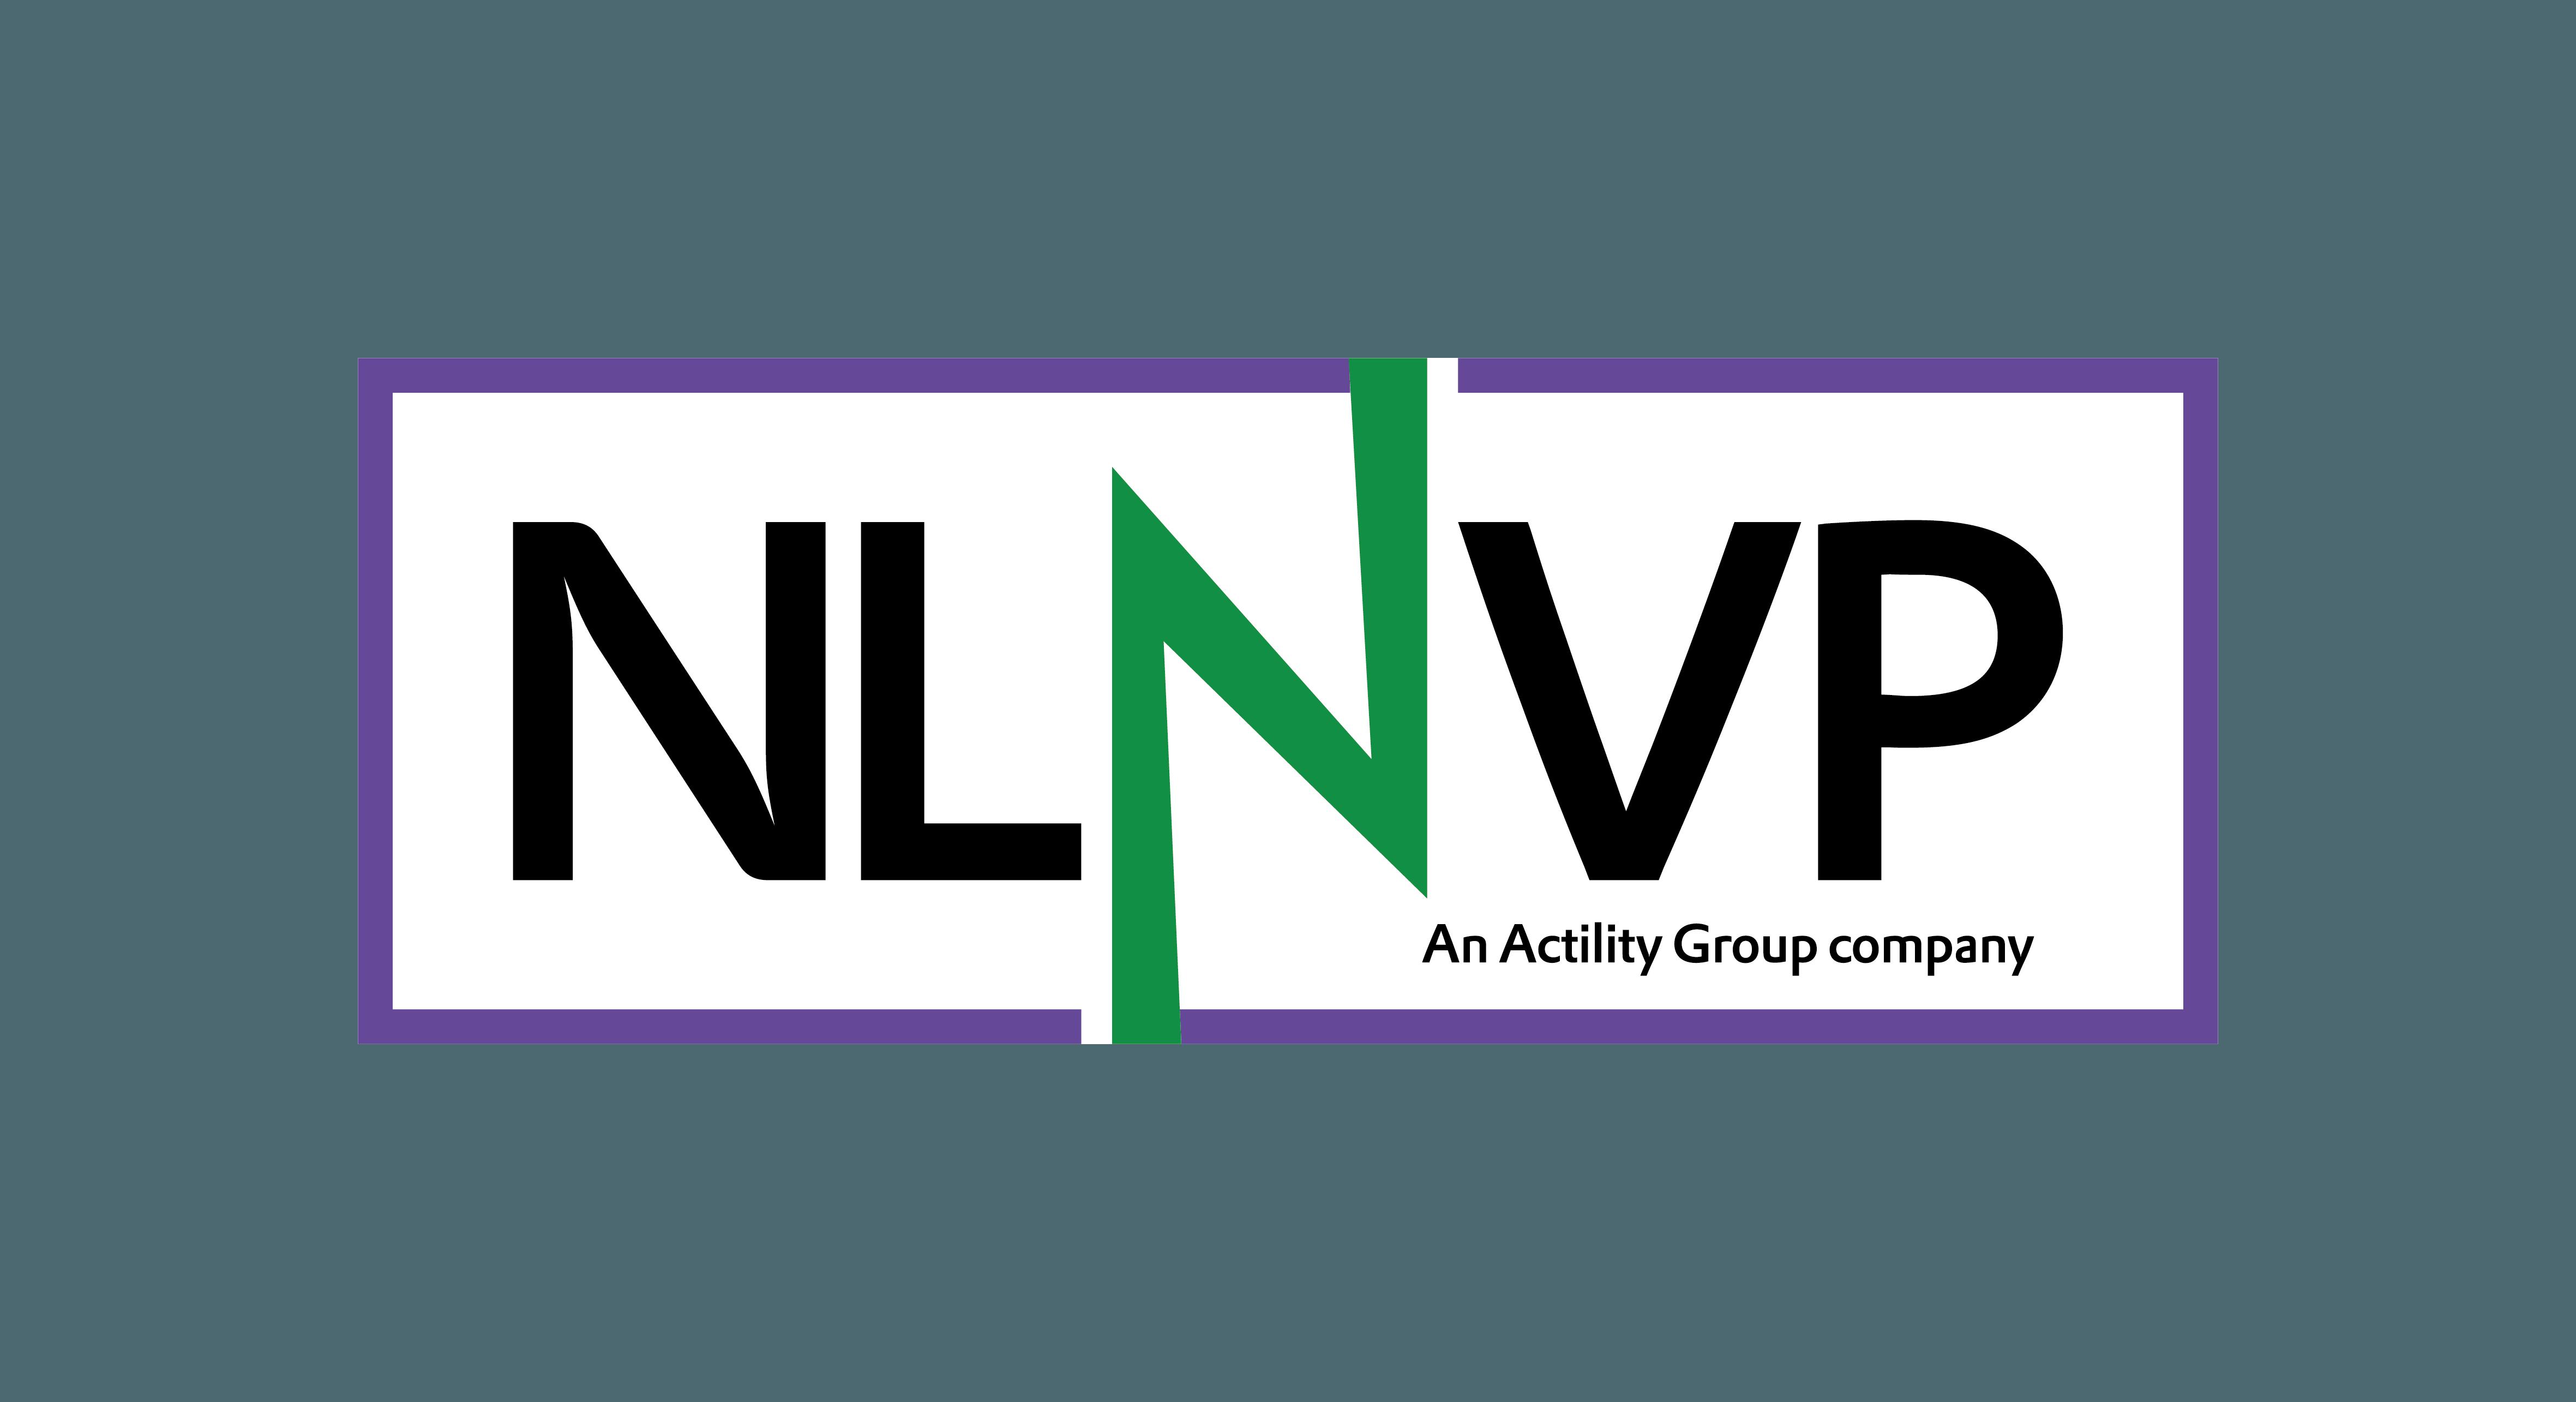 NL Noodvermogenpool with baseline